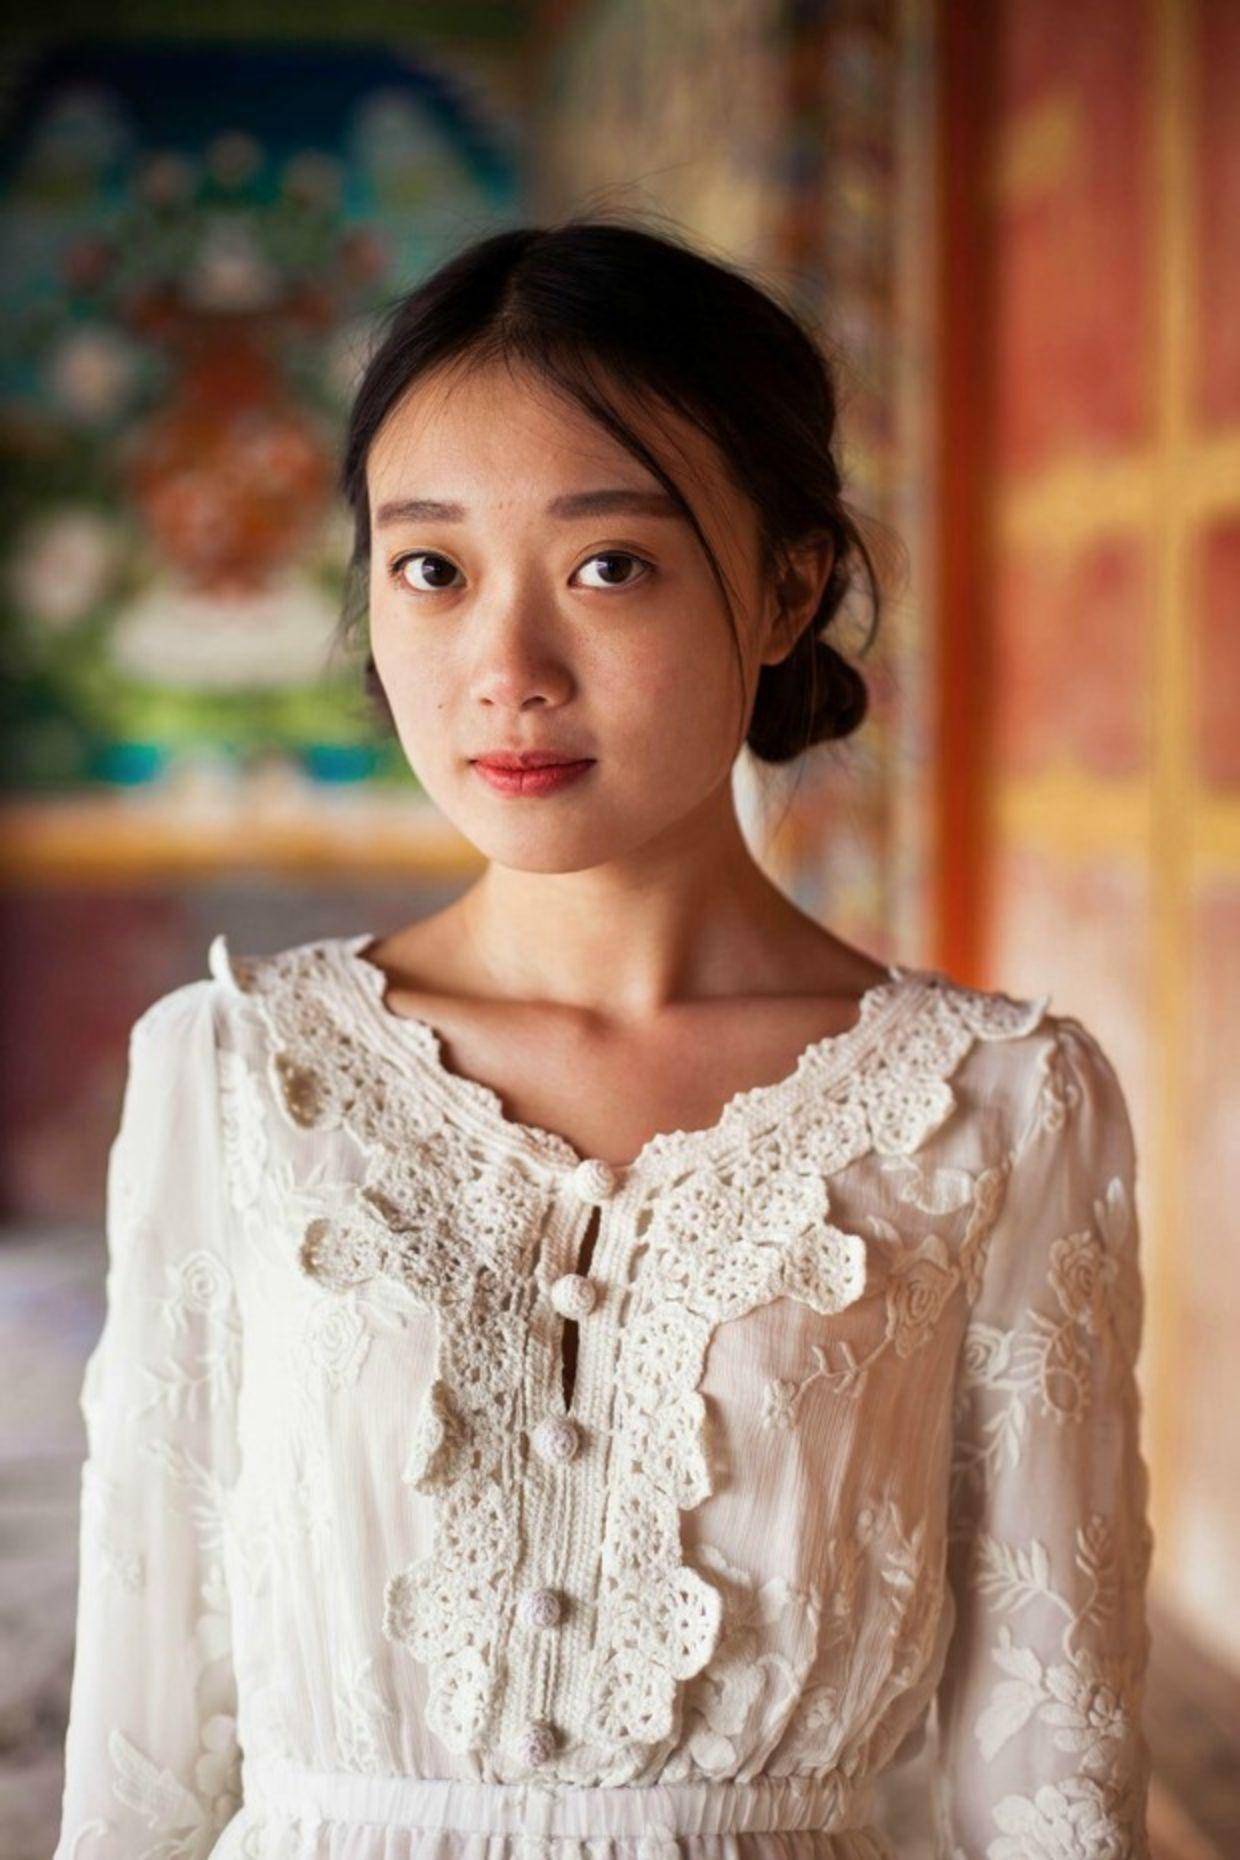 Сабака йибат девчка таджикистан 1 фотография